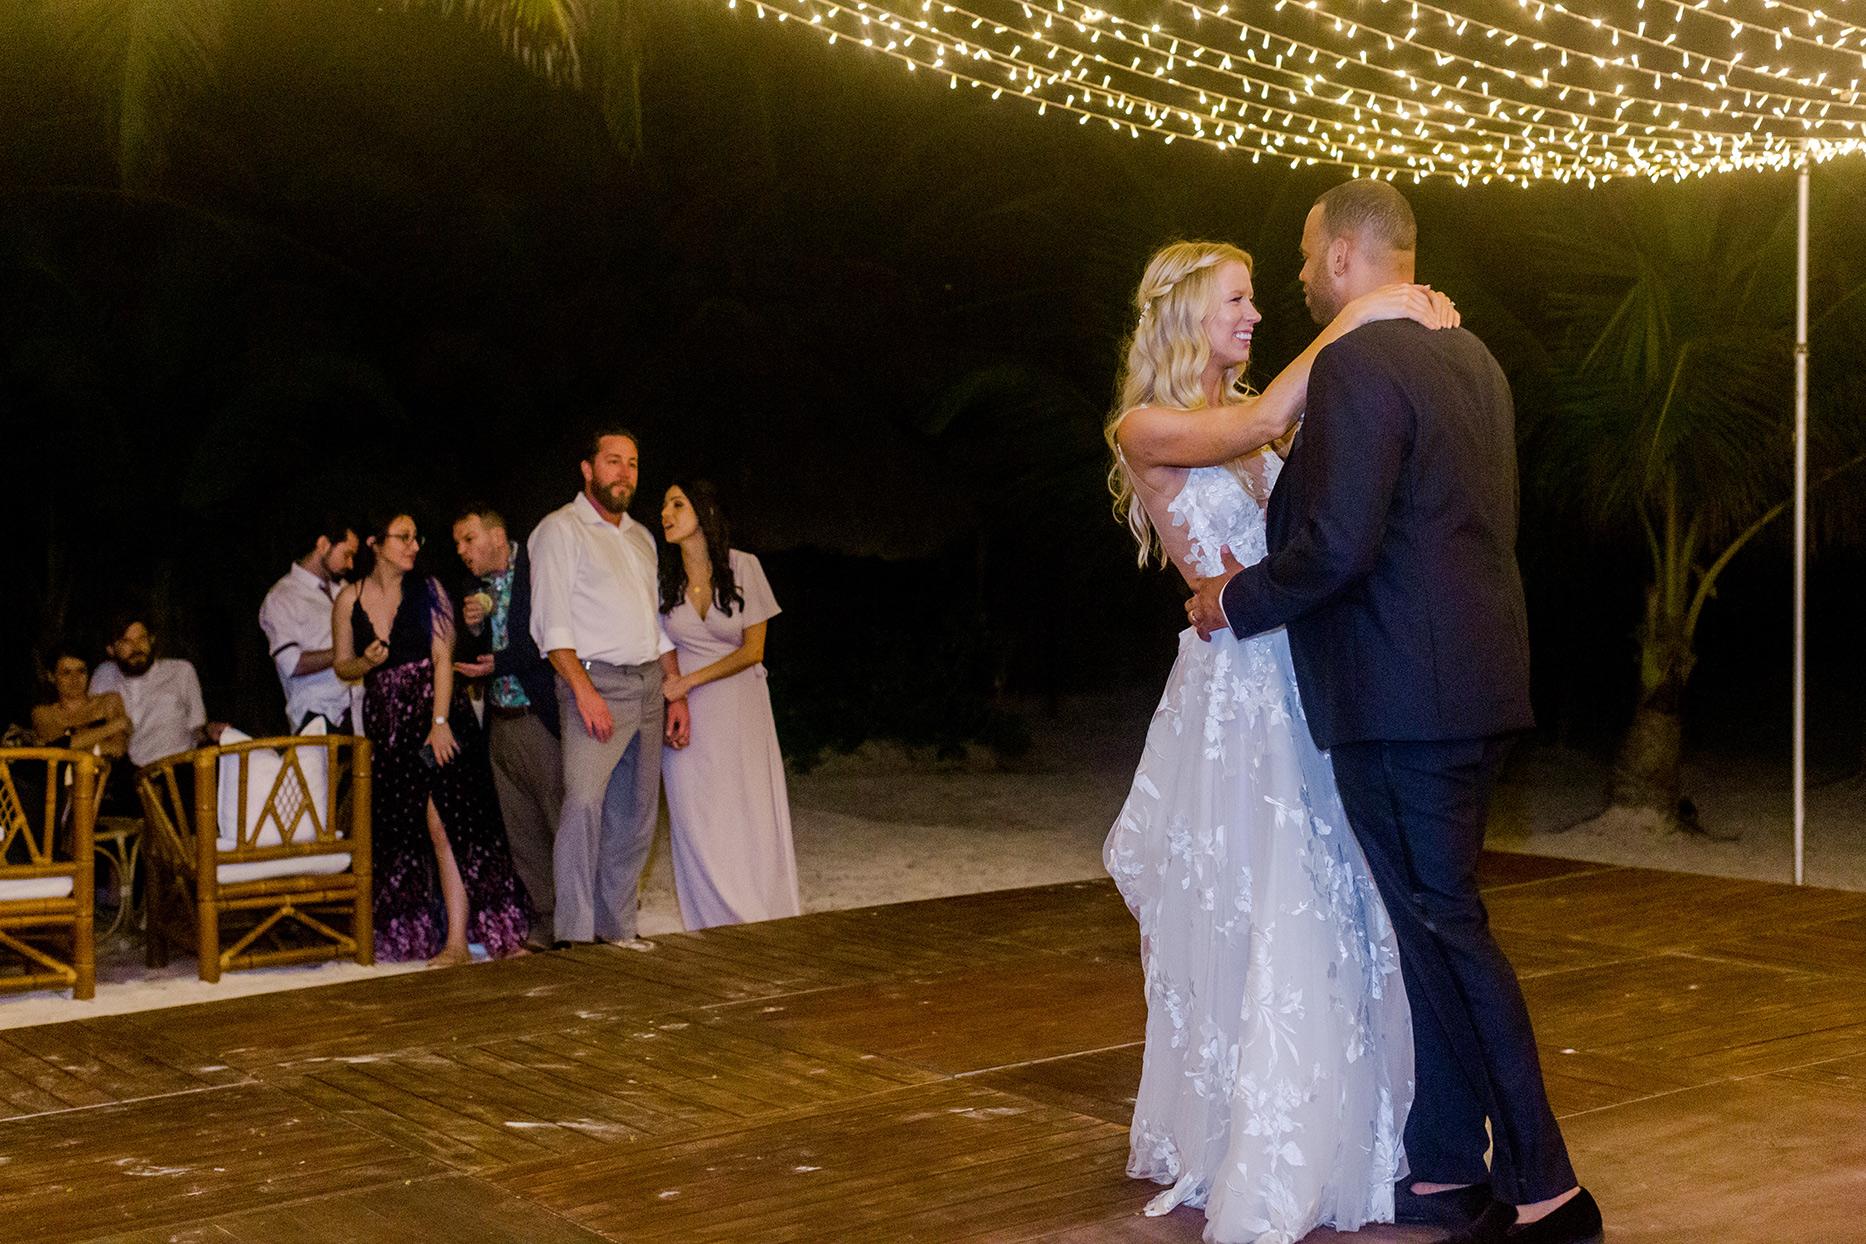 wedding couple first dance on beach reception floor